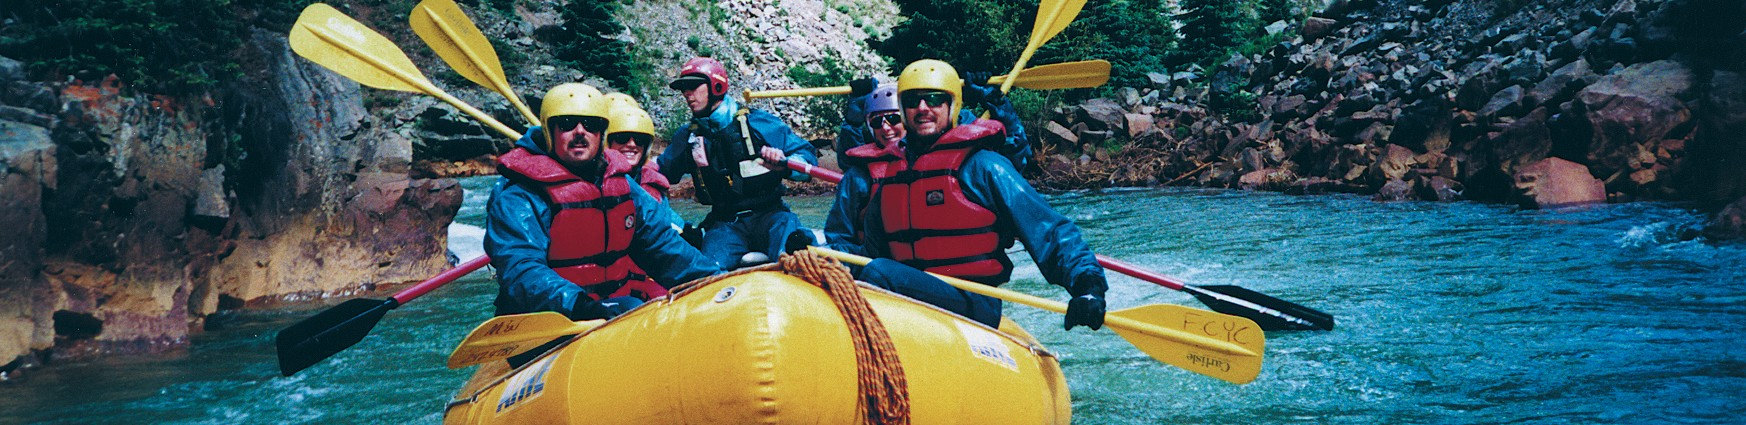 UpperAnimas oars-helmets